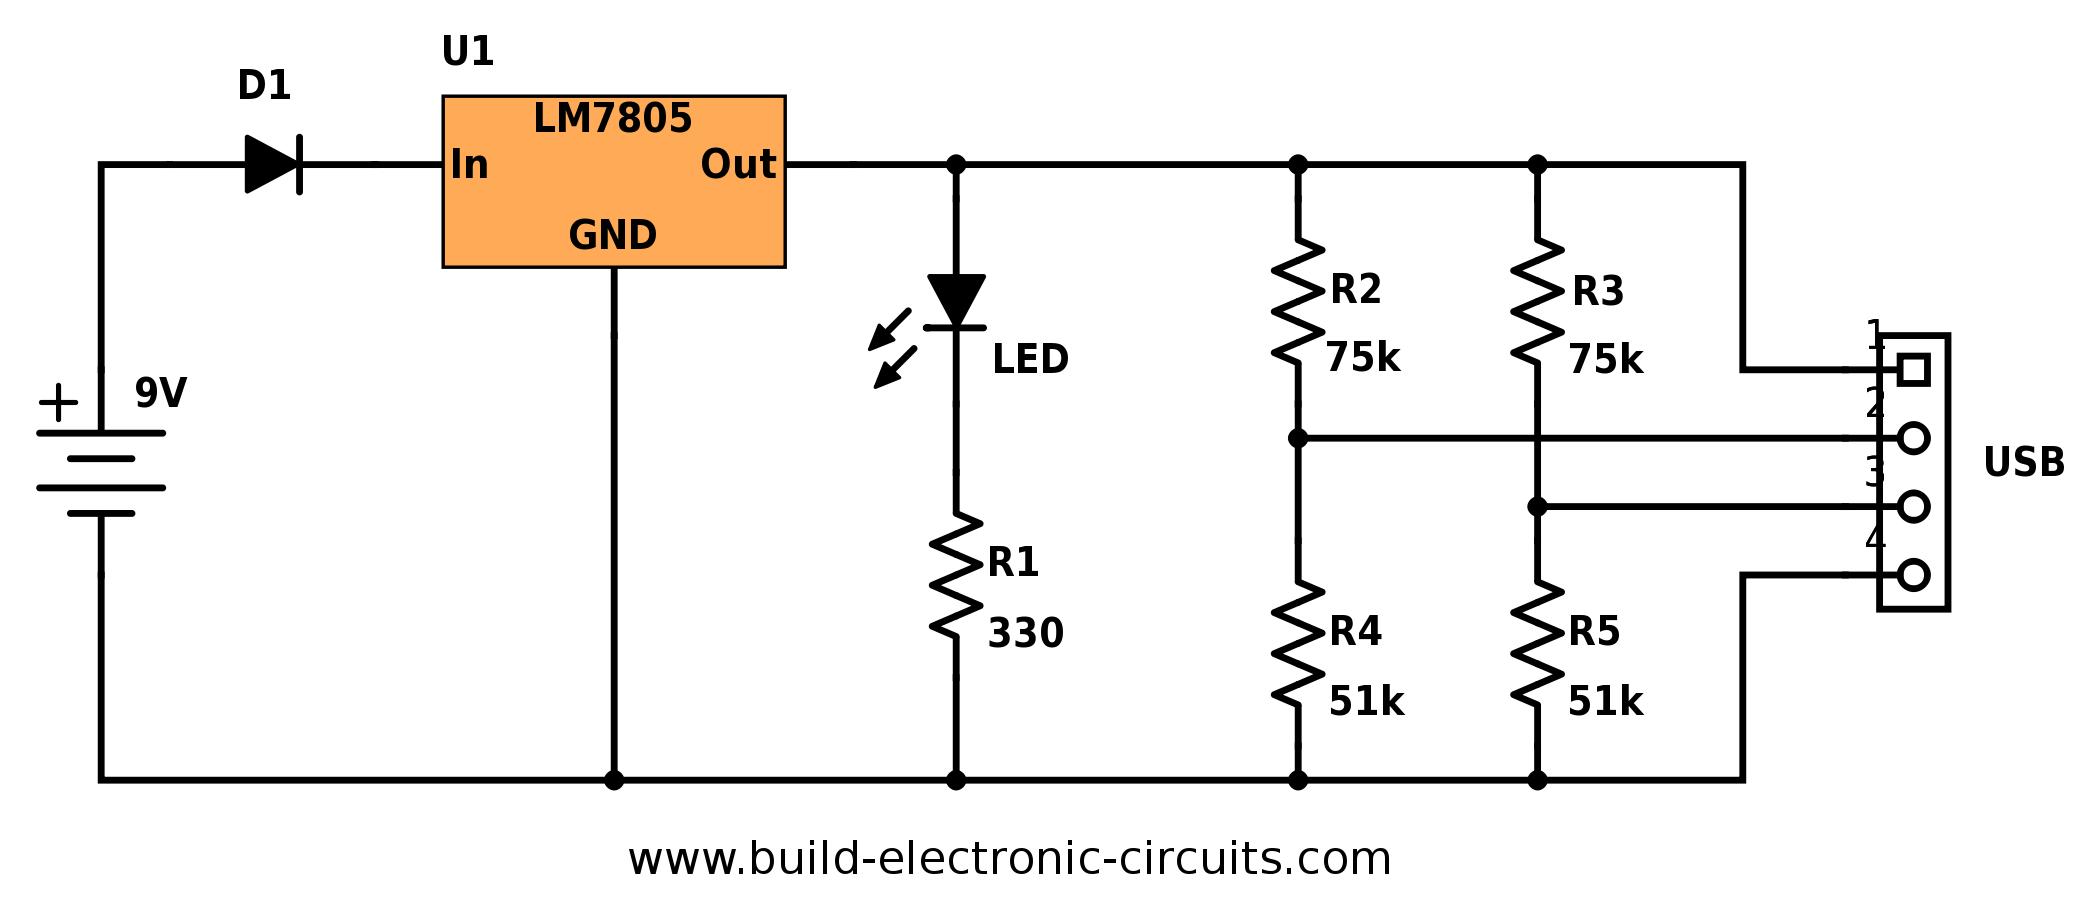 unique circuits diagram diagram wiringdiagram diagramming diagramm visuals visualisation graphical [ 2100 x 920 Pixel ]